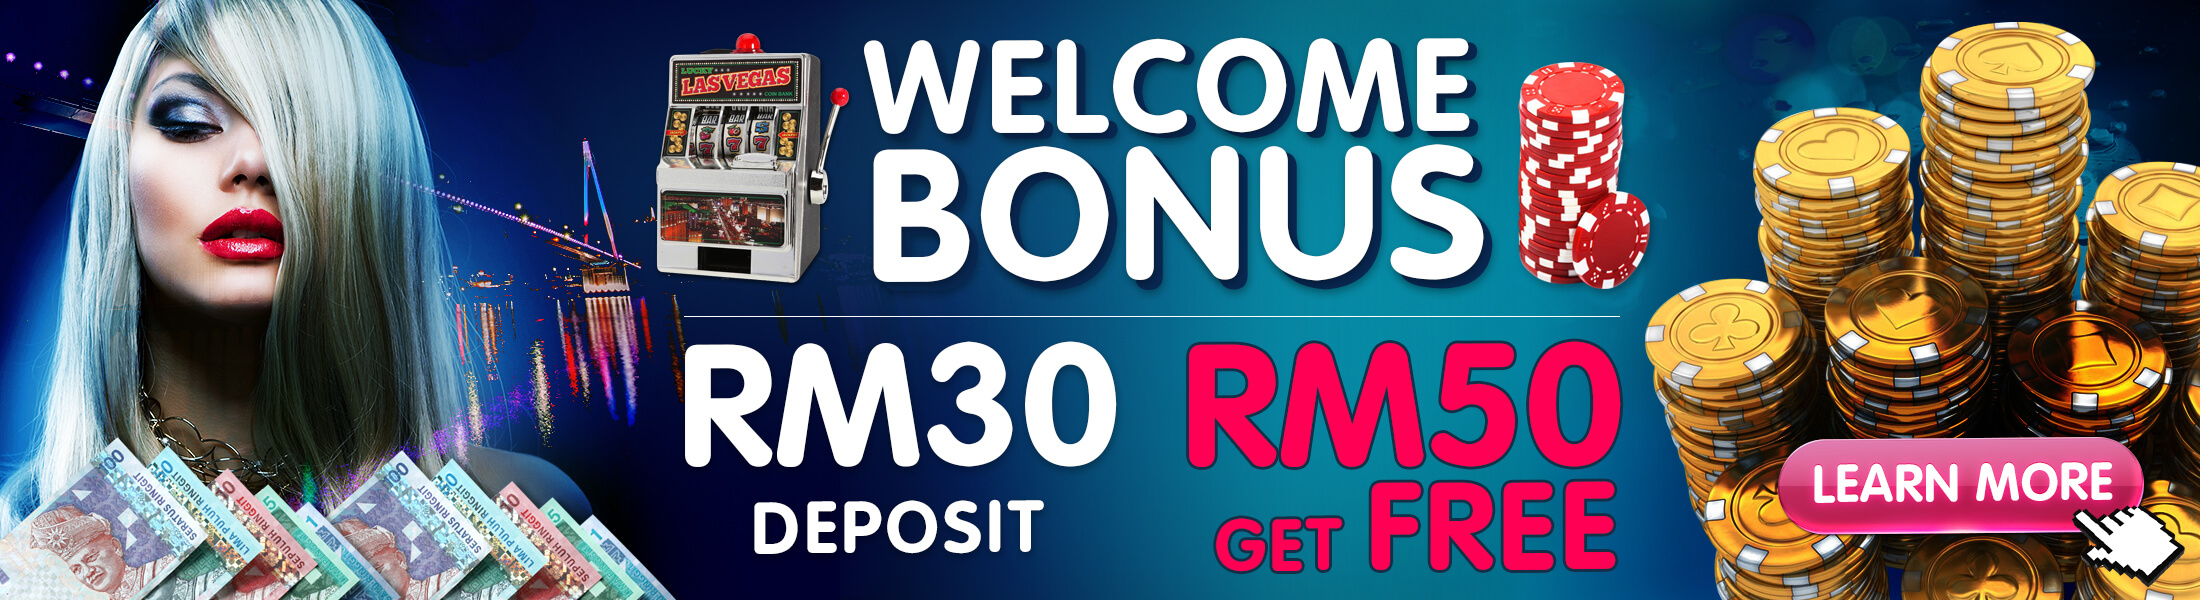 Casino Malaysia Deposit 30 free 50 Promotion